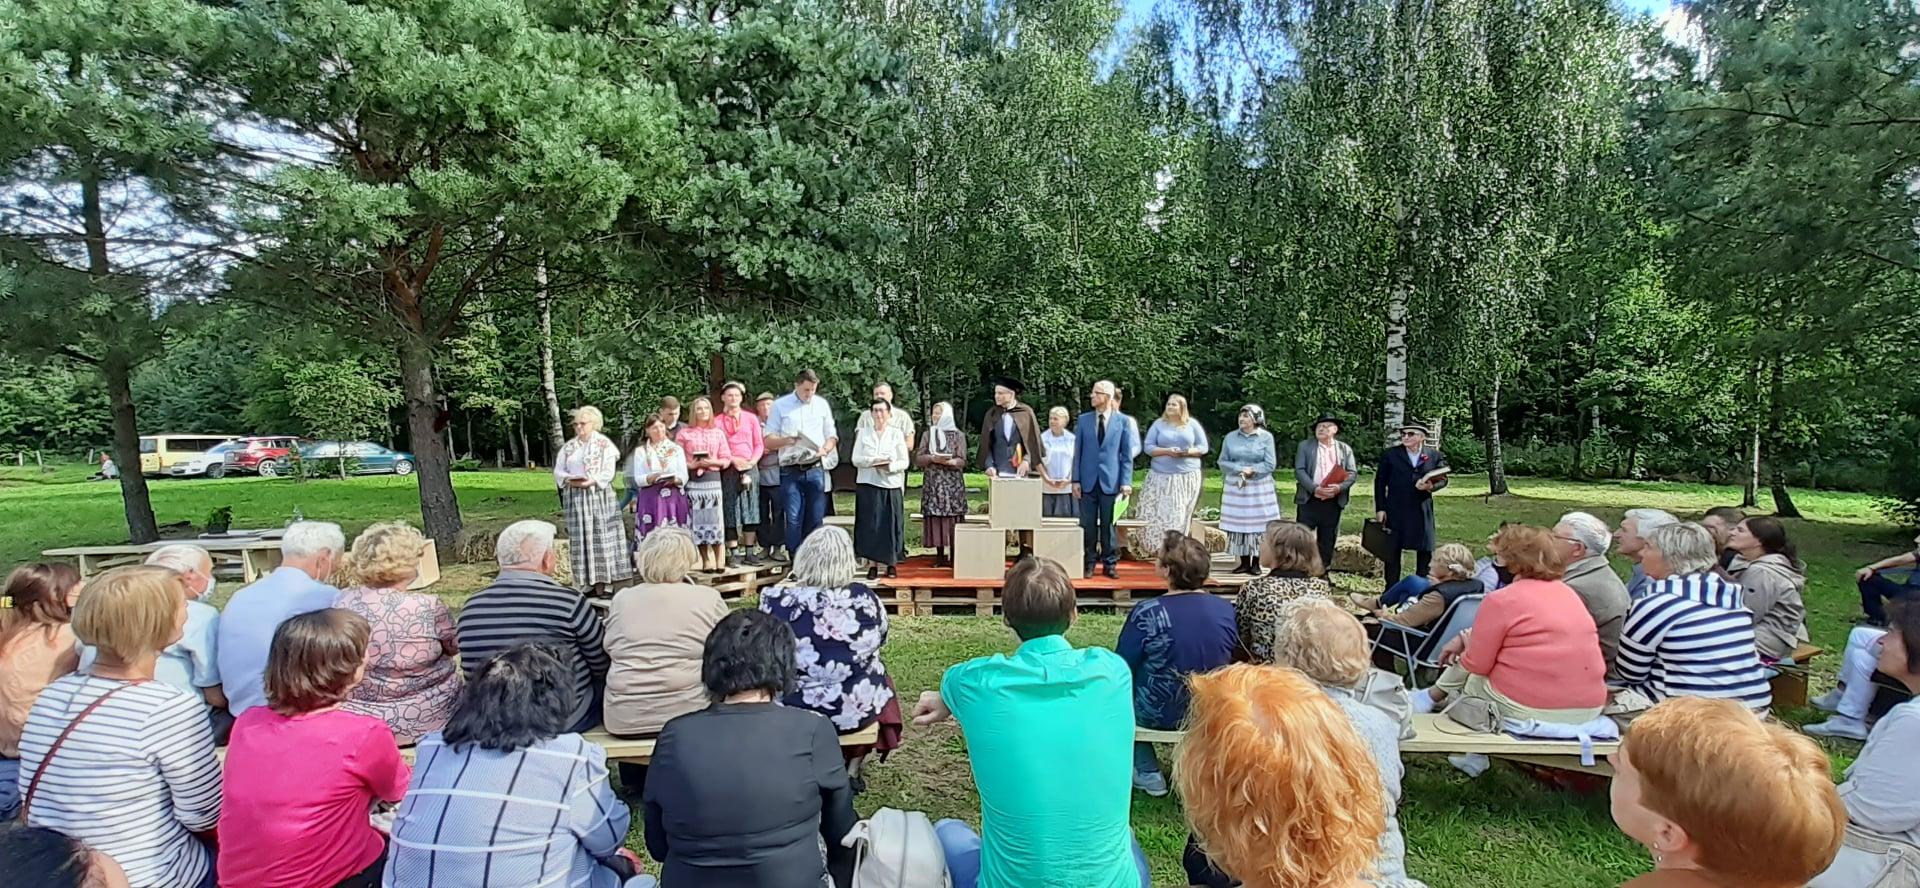 2020-08-30 Tauragės liaudies teatras jubiliejų minėjo spektakliu,muzika ir poezija